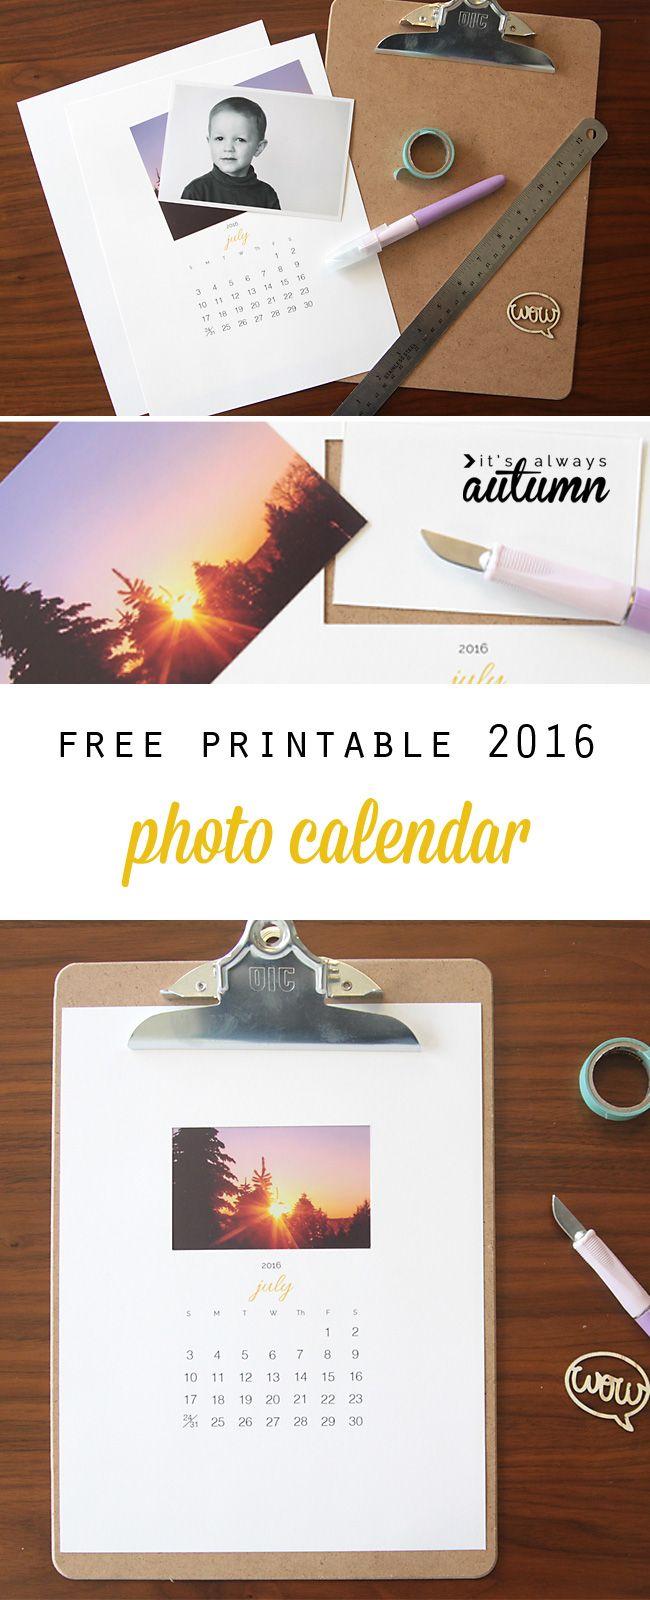 Make a free calendar with your photos